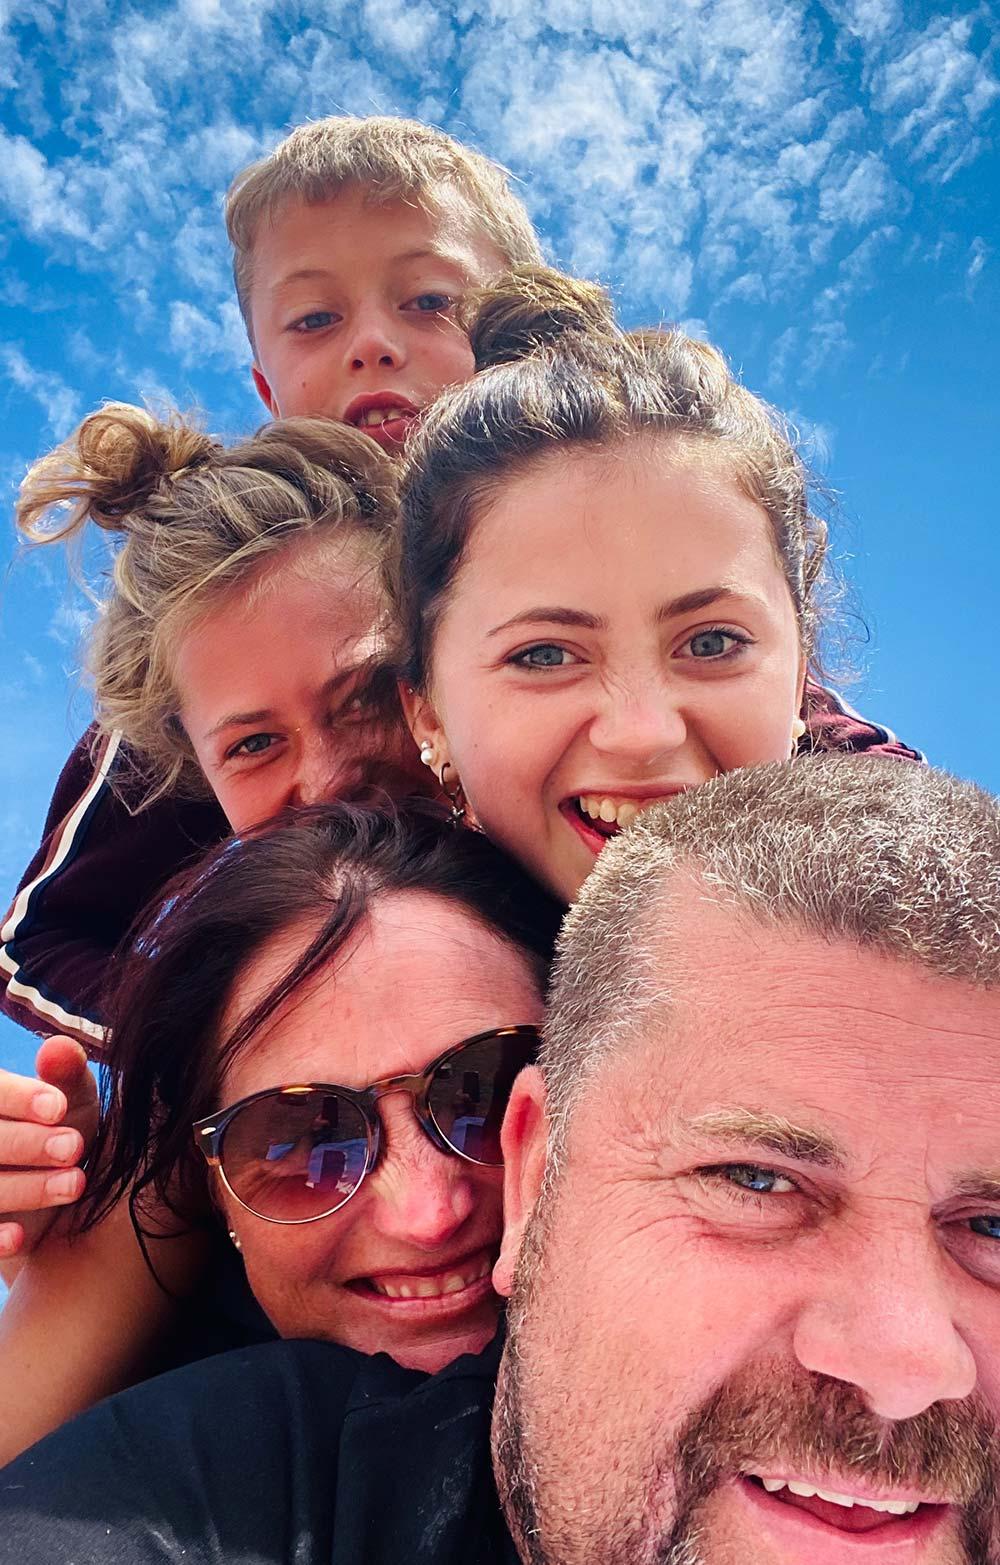 Ben Taylor-Davies and Family